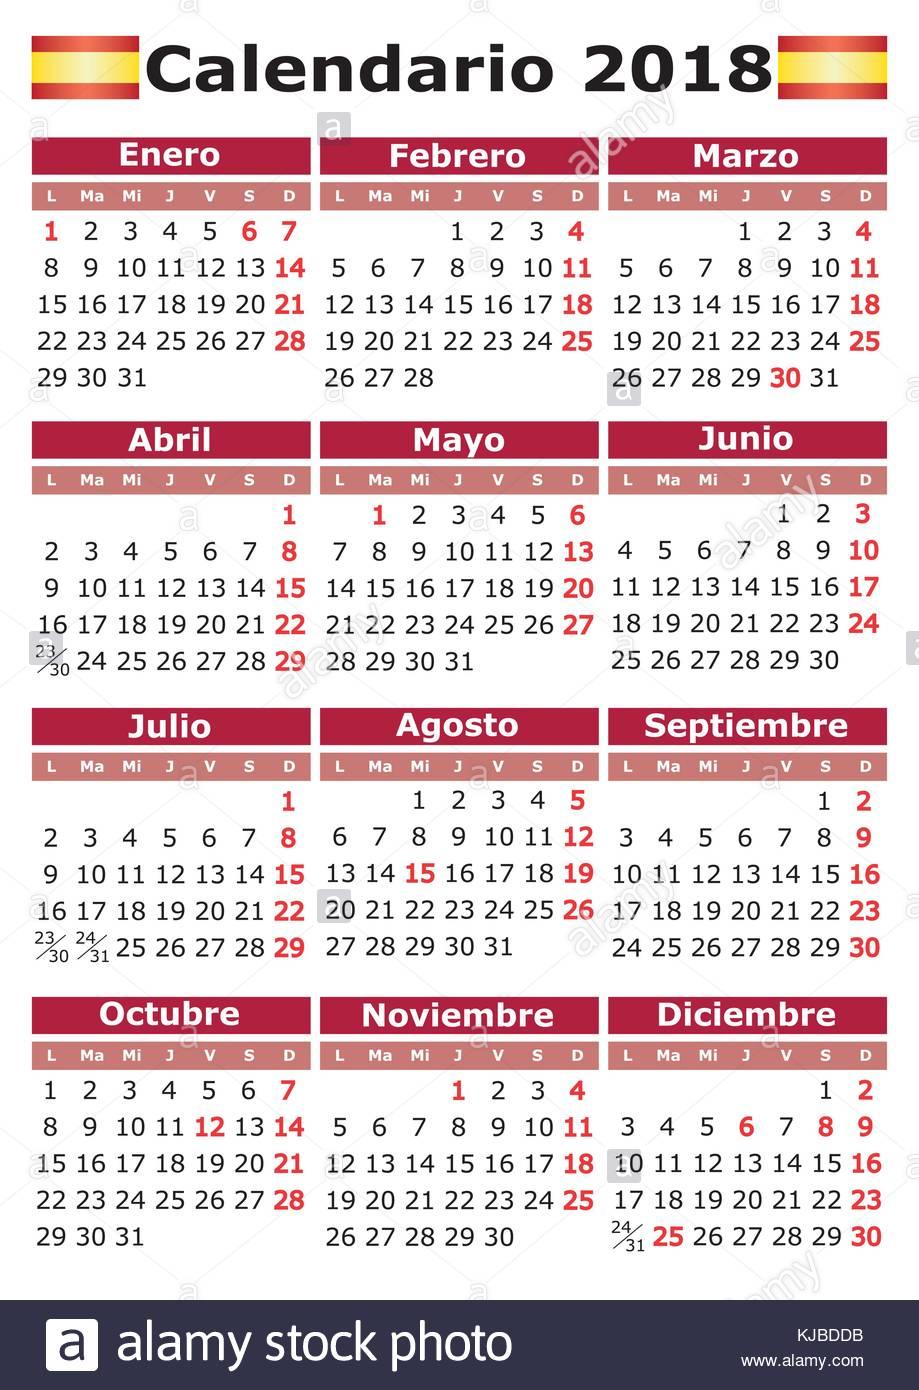 Calendar Days Of The Week In Spanish.Calendario 2018 Vertical Spanish Calendar With Festive Days Pocket